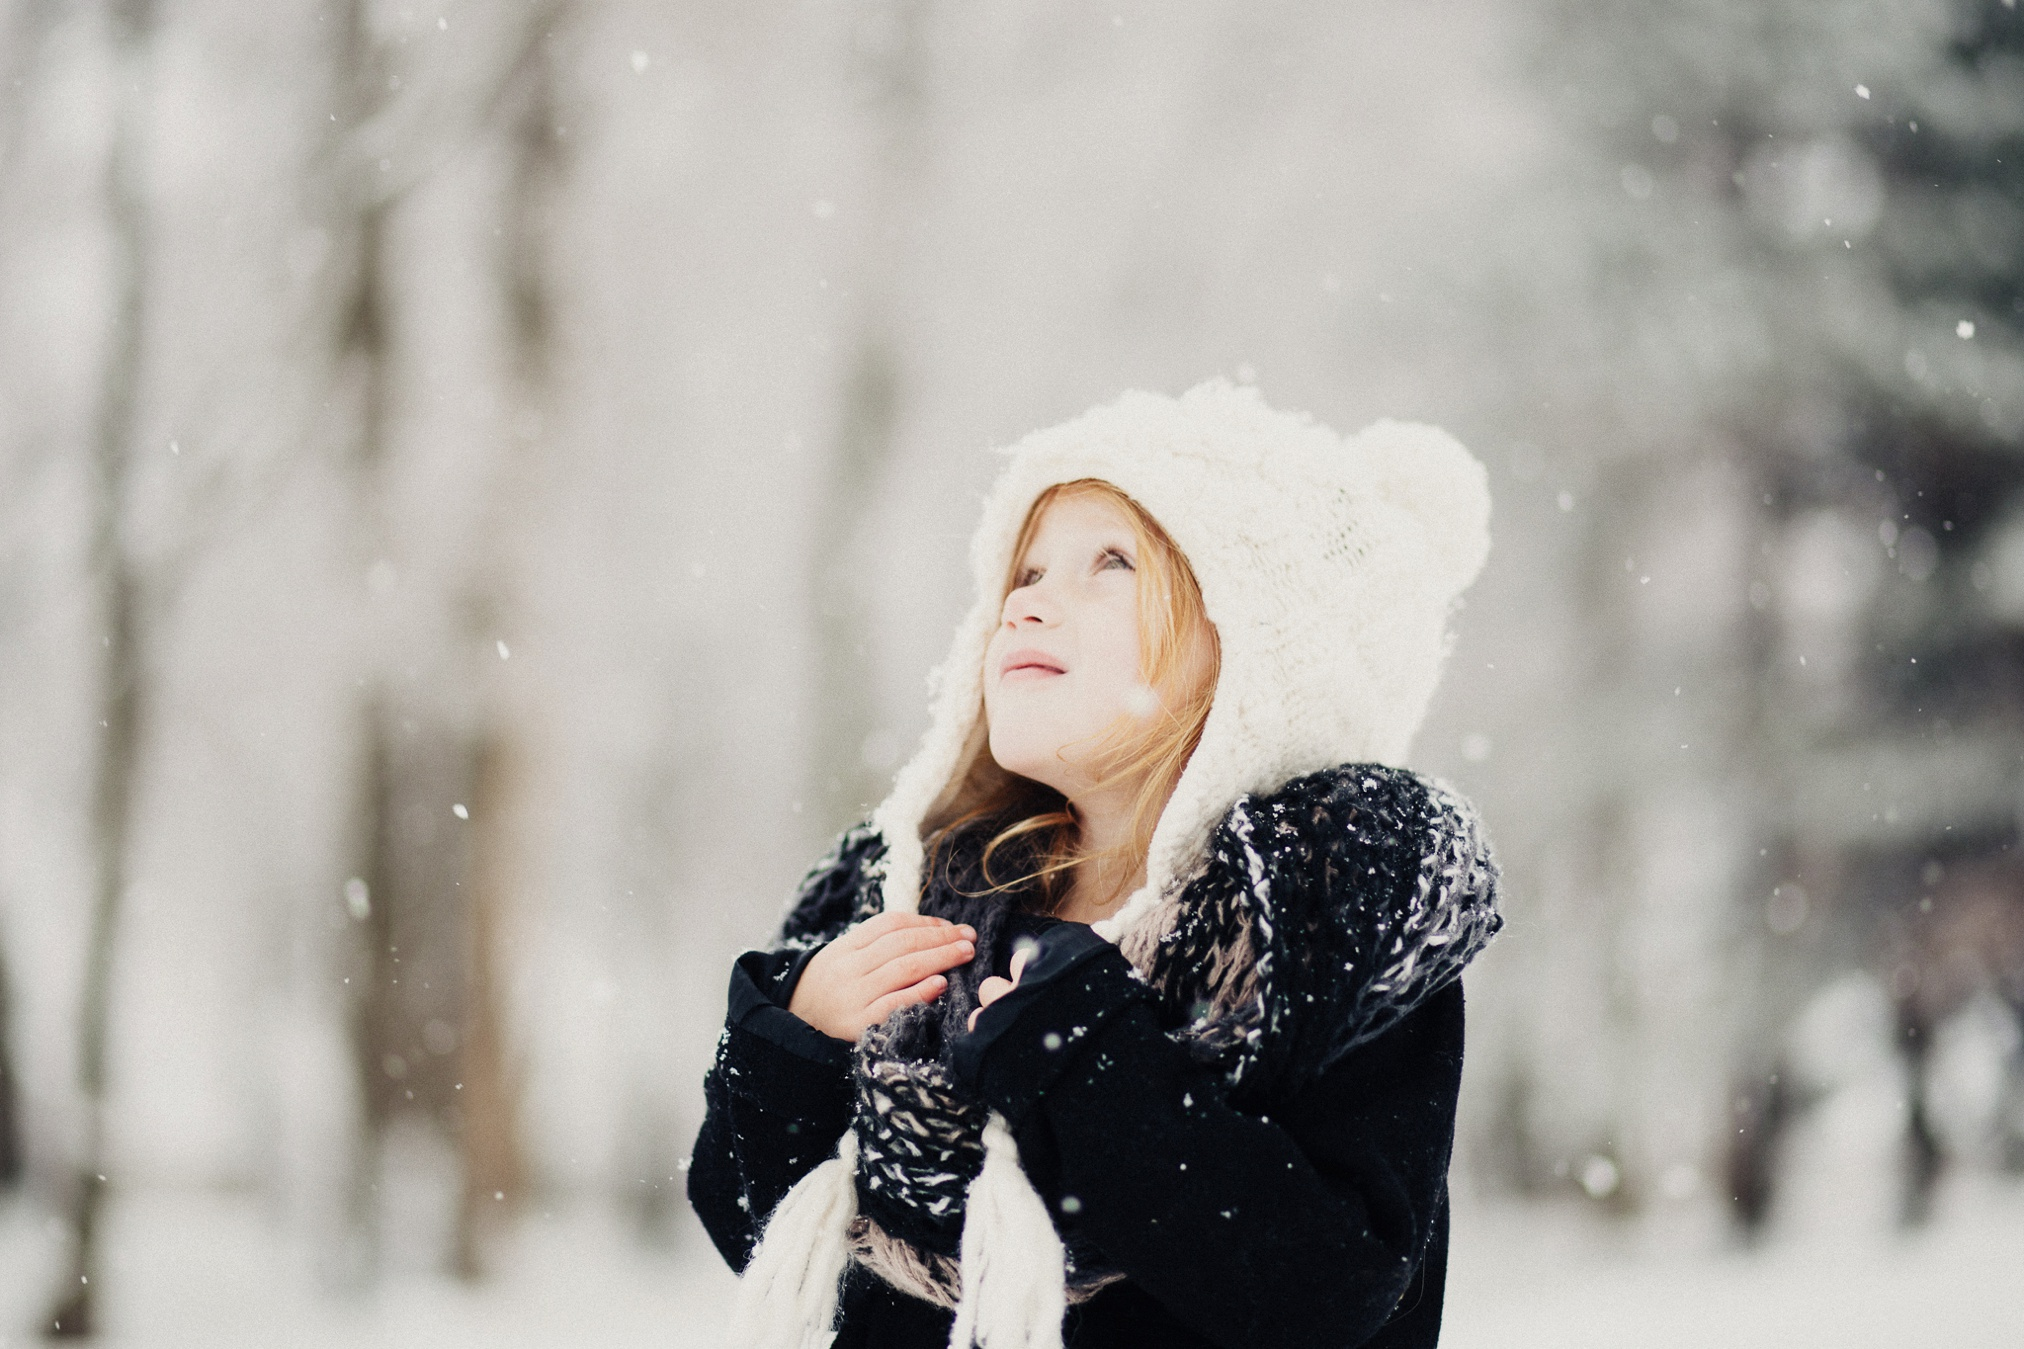 Zoe_Cohen_Snow_2015_web-45.jpg